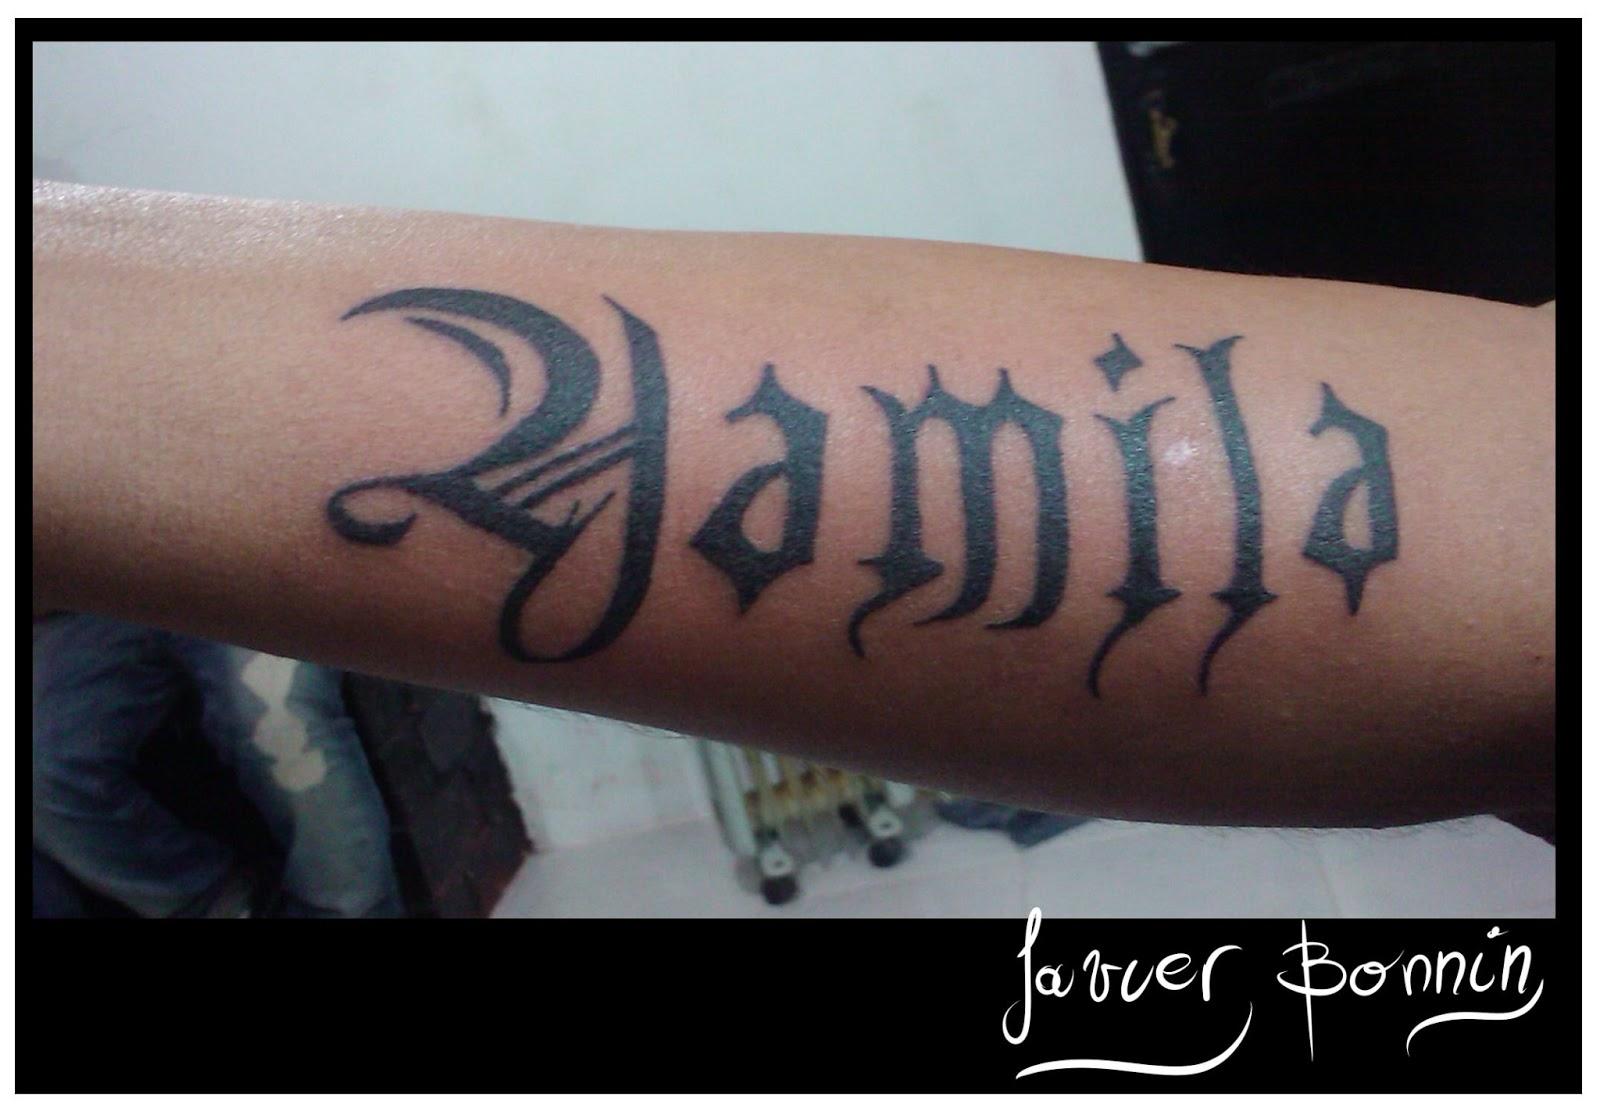 Te Amo Escrito En Pluma En La Arena Imagen De Archivo: Javier Bonnin Tatuajes: Yamila Y Brian